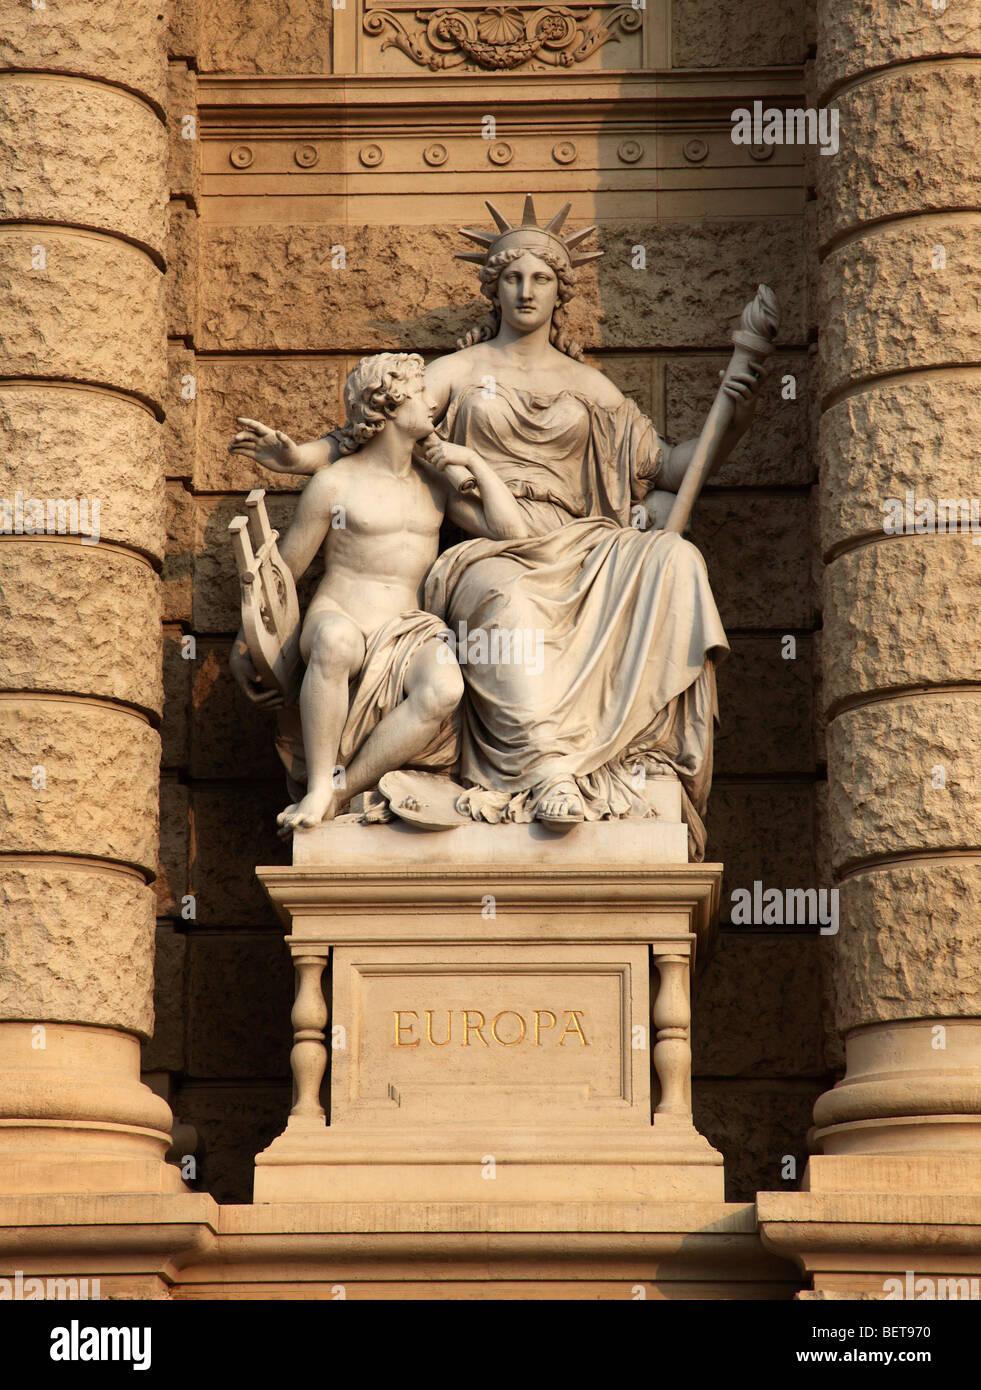 Austria, Vienna, Museum of Natural History, Europe statue - Stock Image